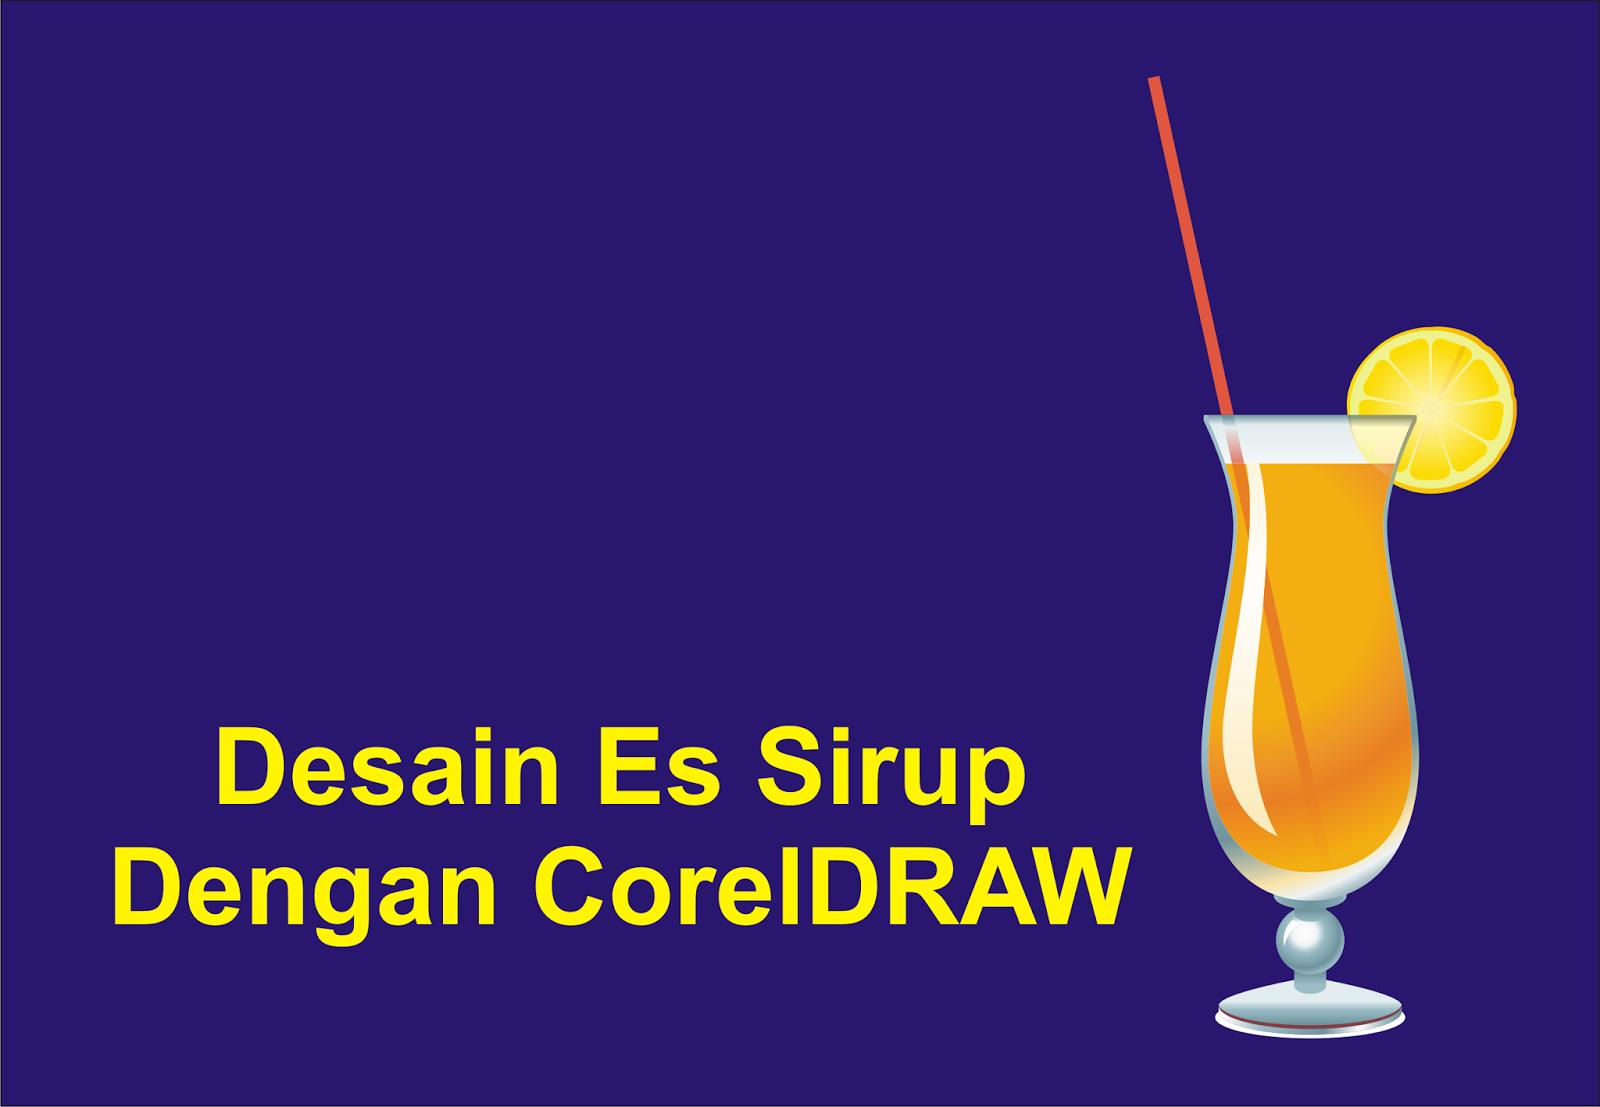 http://desainfarhan.blogspot.com/2014/03/desain-es-sirup-dengan-coreldraw.html